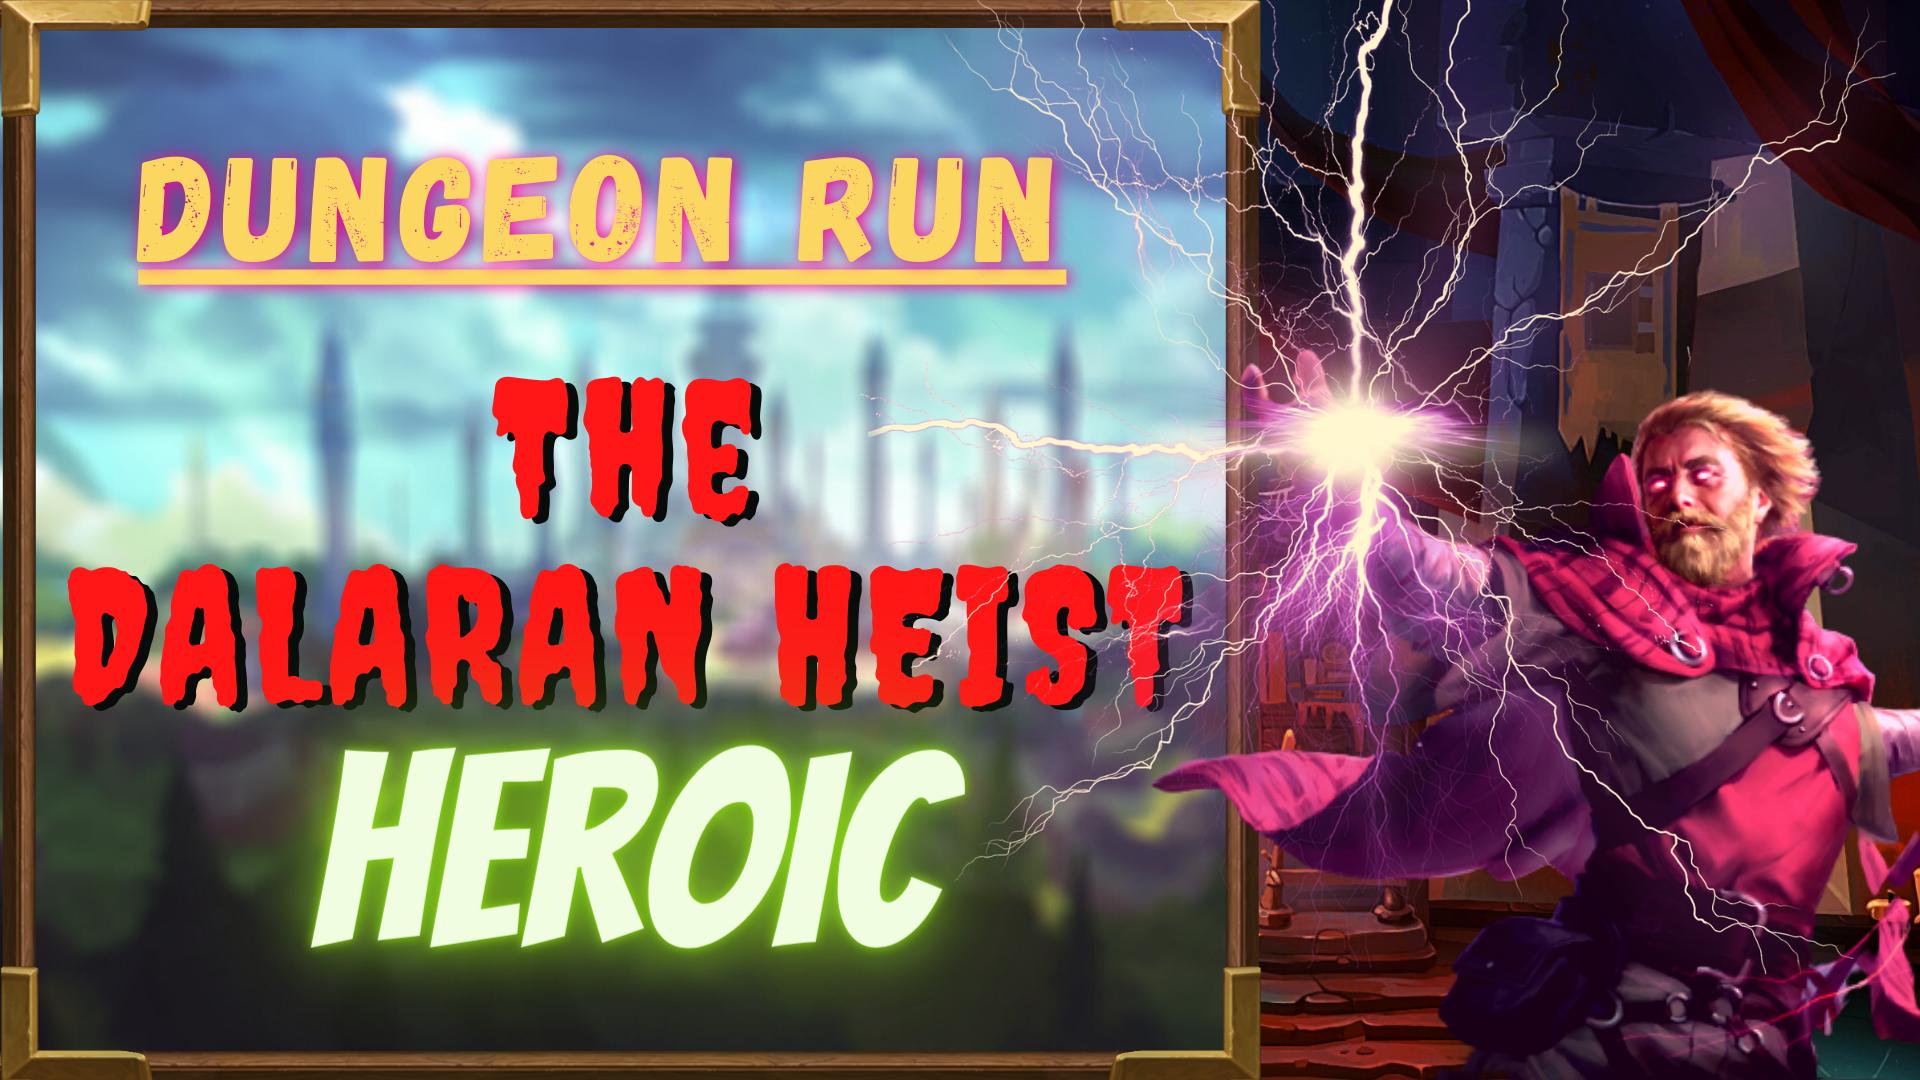 DUNGEON RUN: THE DALARAN HEIST - HEROIC Zafari - e2p.com